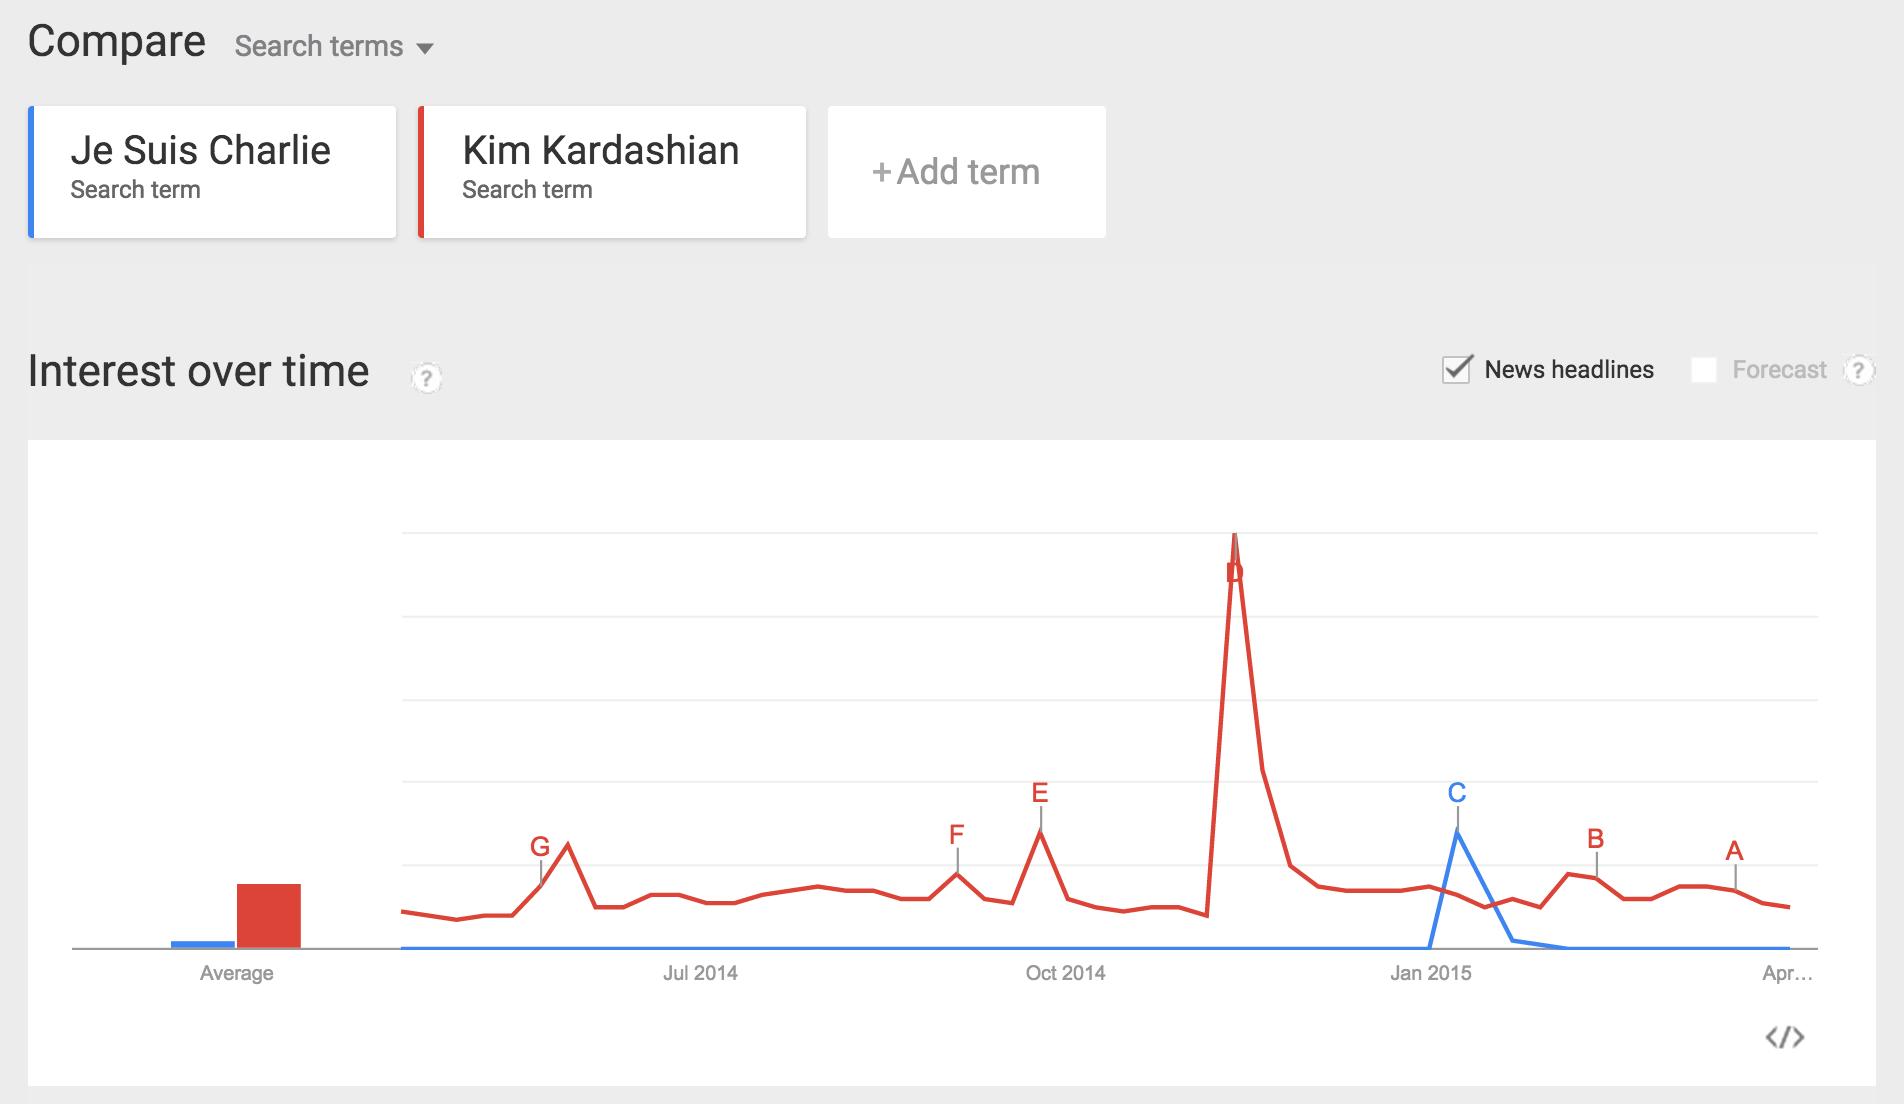 JE SUISWHO AGAIN?Google Trends:  Je Suis Charlie  [blue] and Kim Kardashian [red], April 2014-April 2015